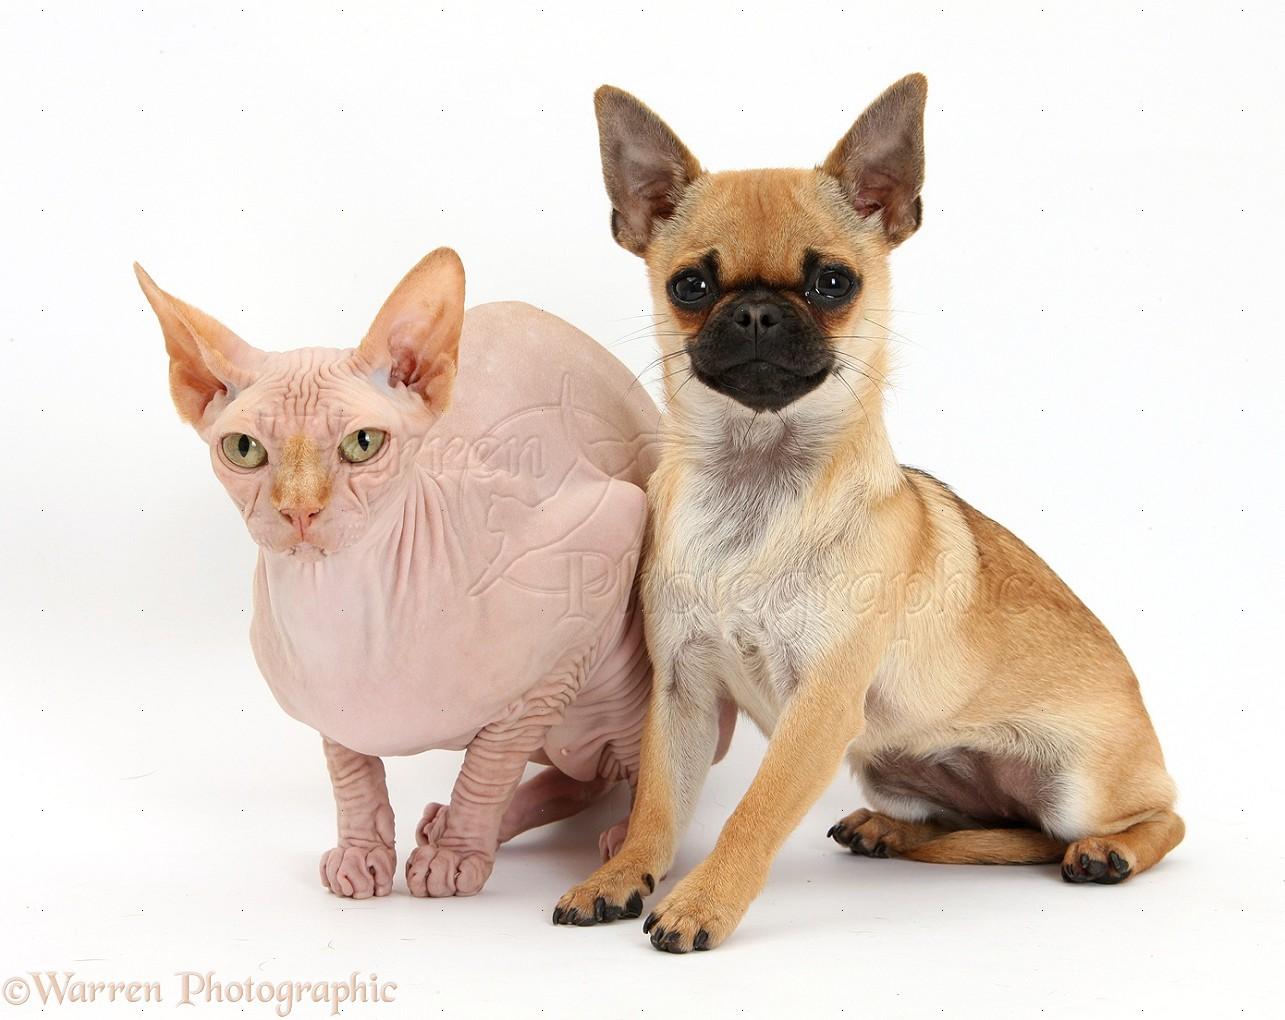 WP36299 Chug (Pug x Chihuahua) bitch and Sphinx cat.